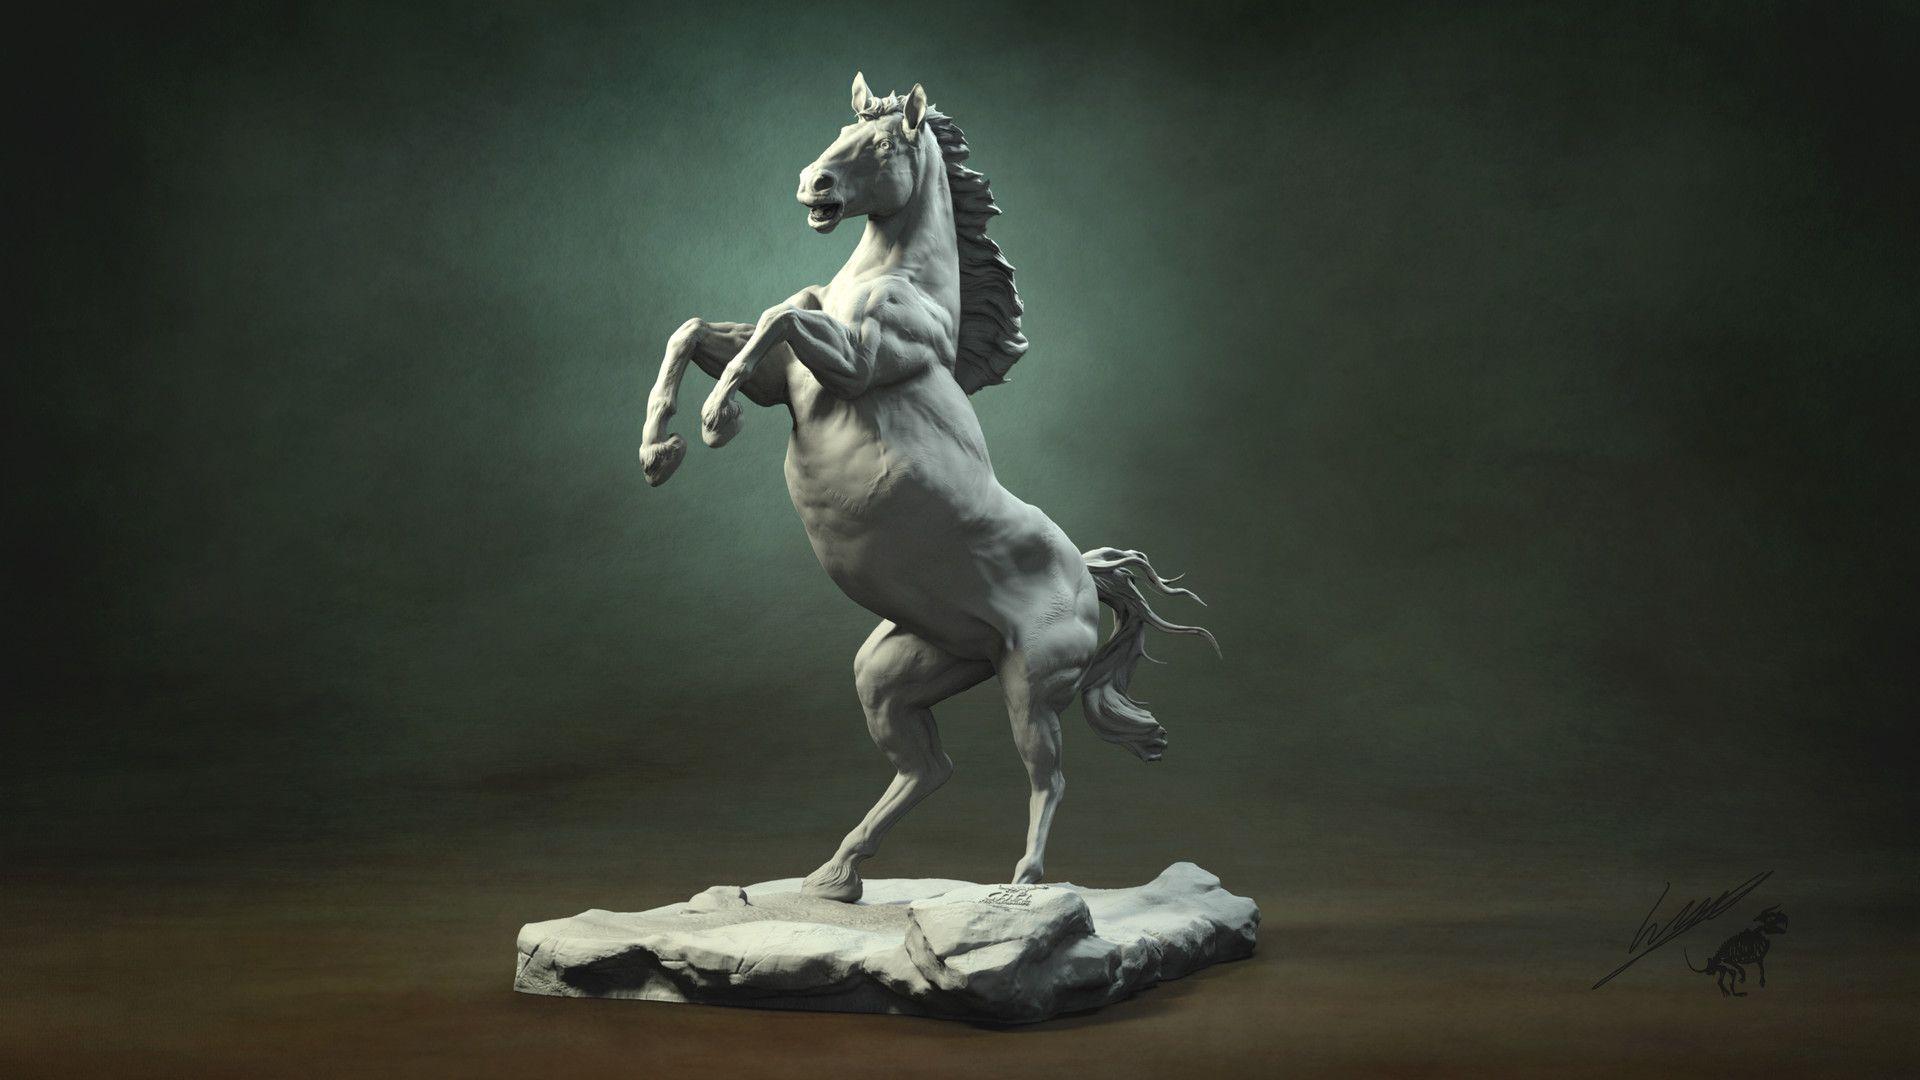 ArtStation - Horse anatomy study, Gael Kerchenbaum   Horses   Pinterest